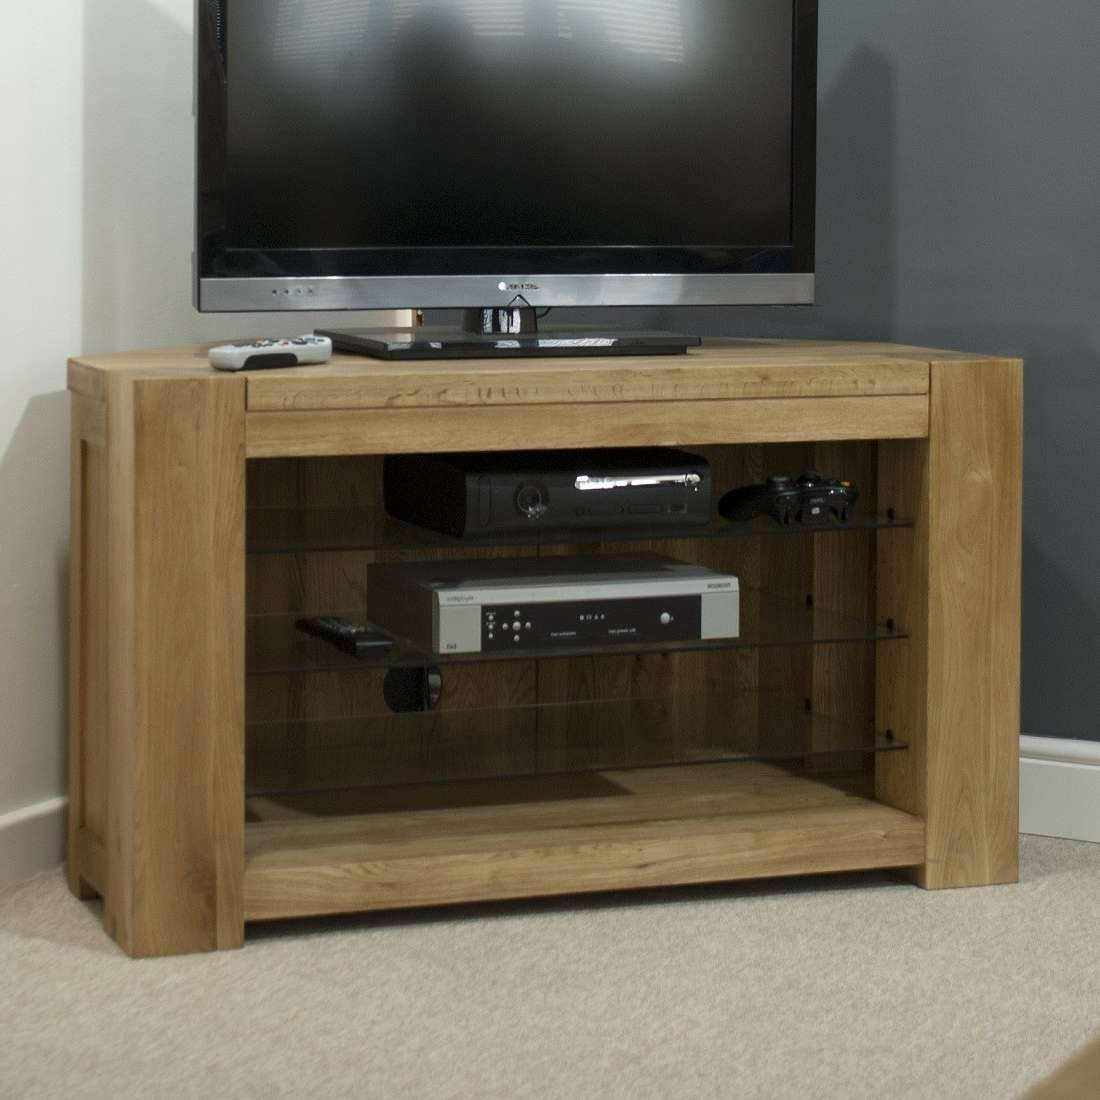 Oak Tv Units / Cabinets | Oak Furniture Uk Pertaining To Light Oak Corner Tv Cabinets (Gallery 8 of 20)